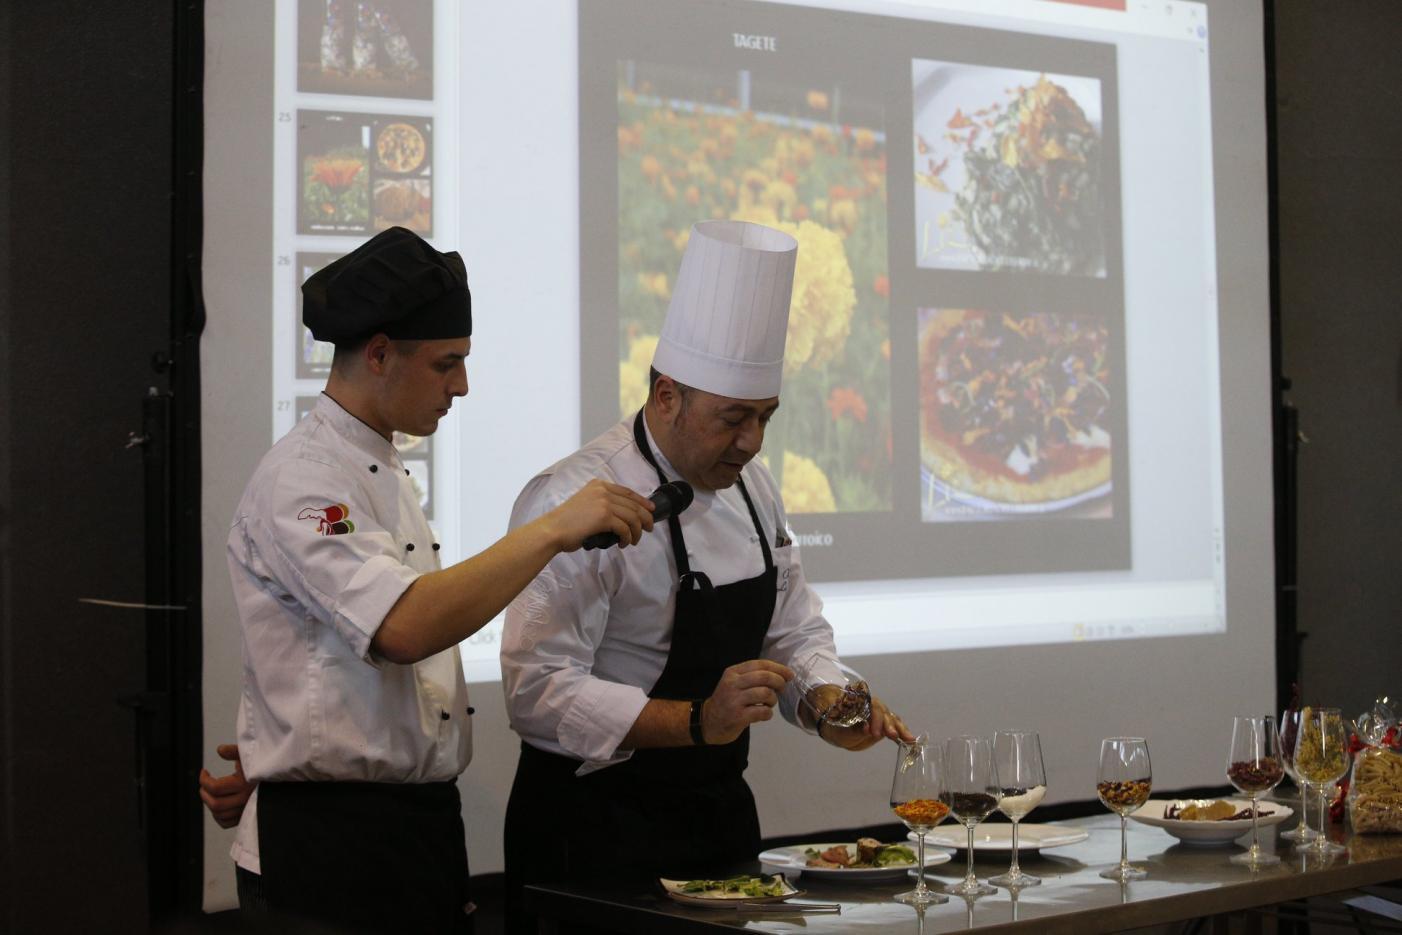 Report cucinare 2018 for Cucinare 2018